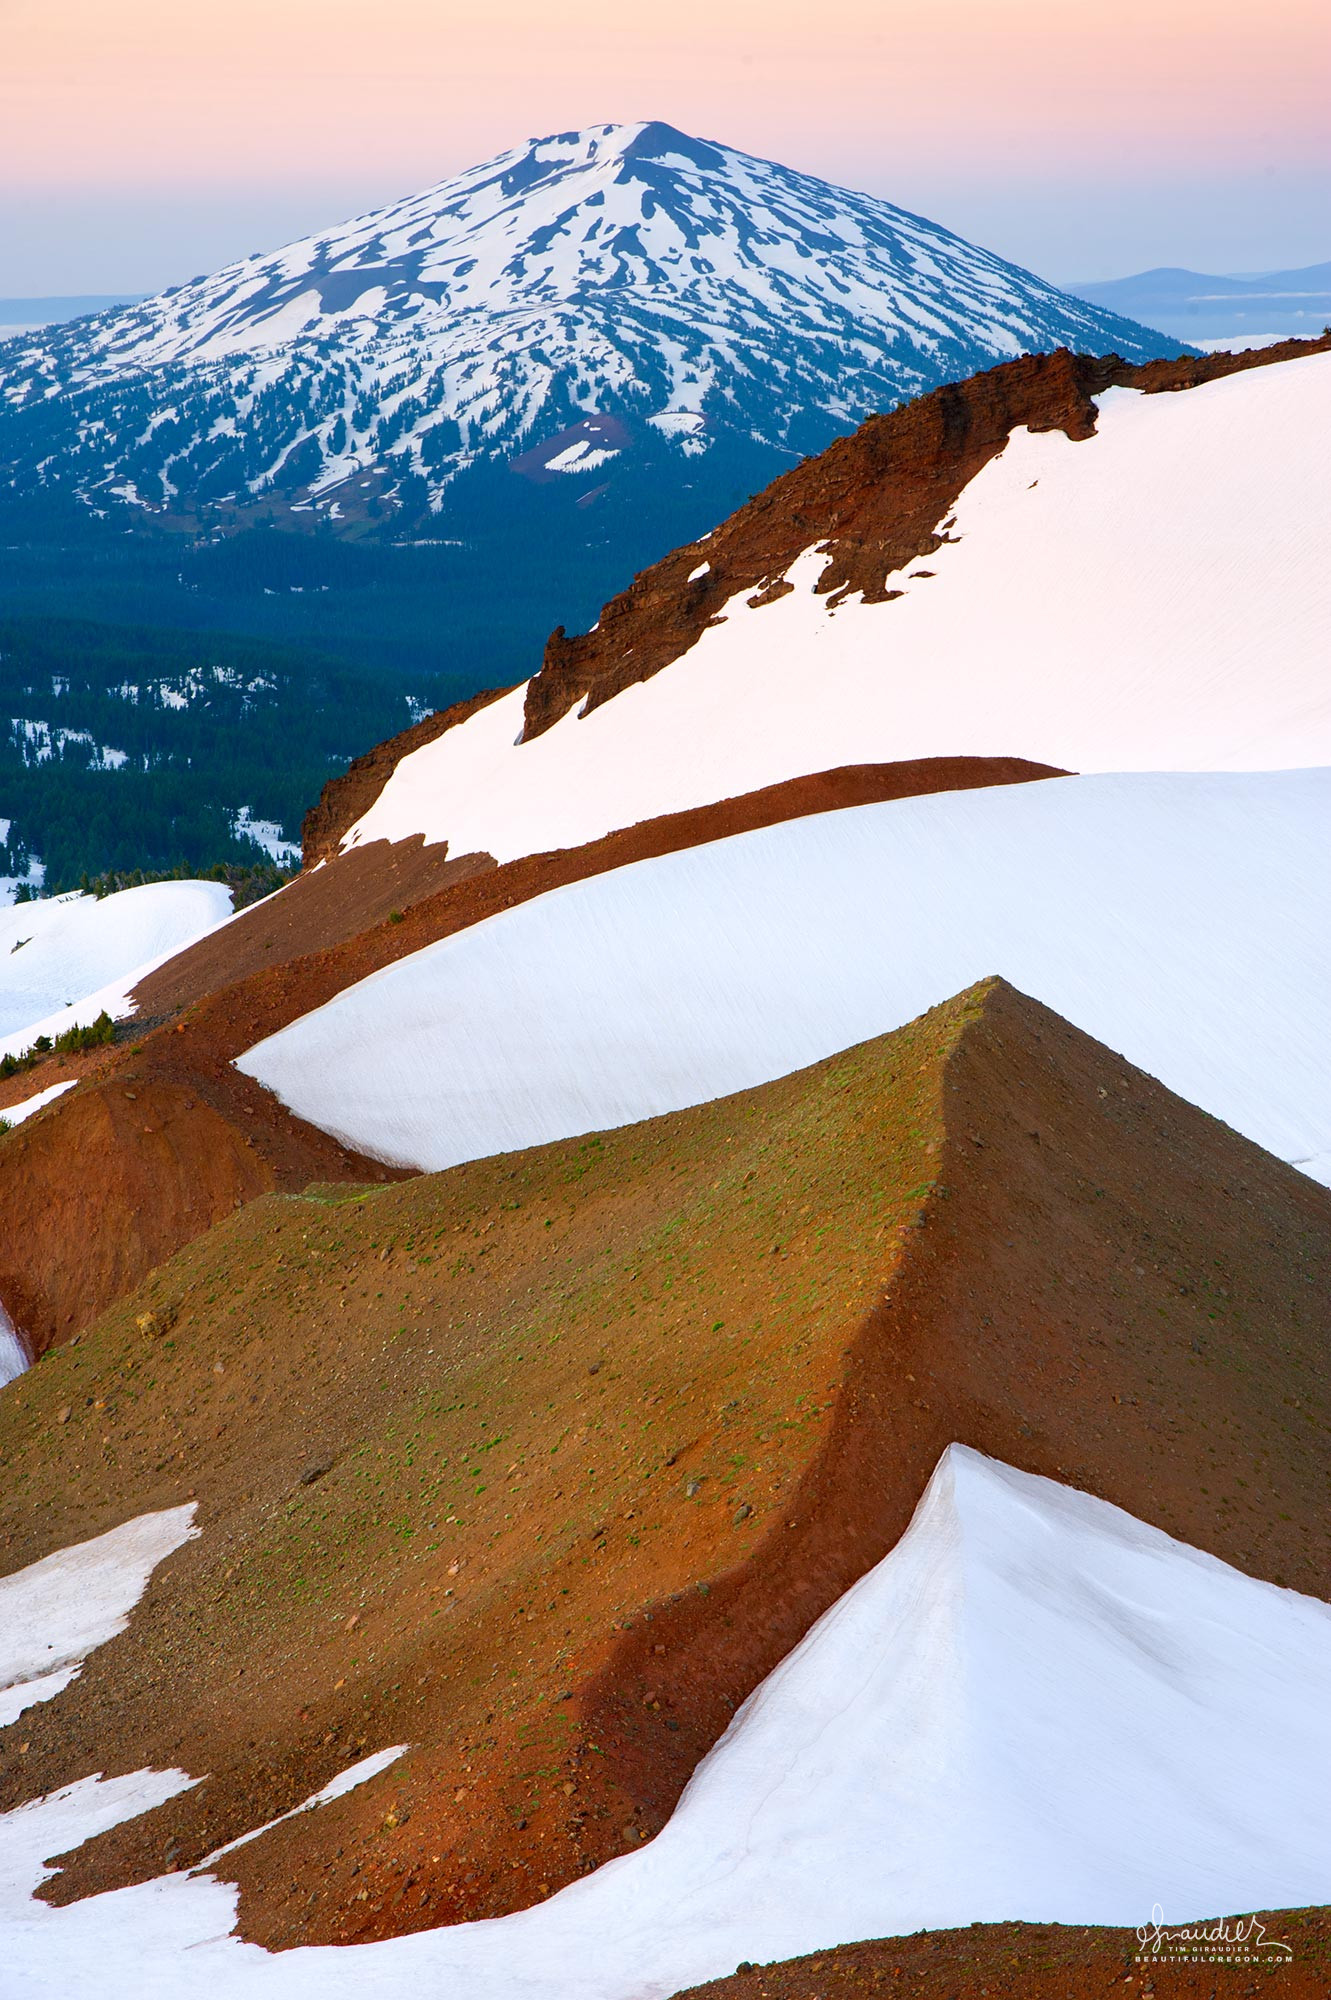 Mount Bachelor and the Broken Top moraine, Central Oregon Cascades